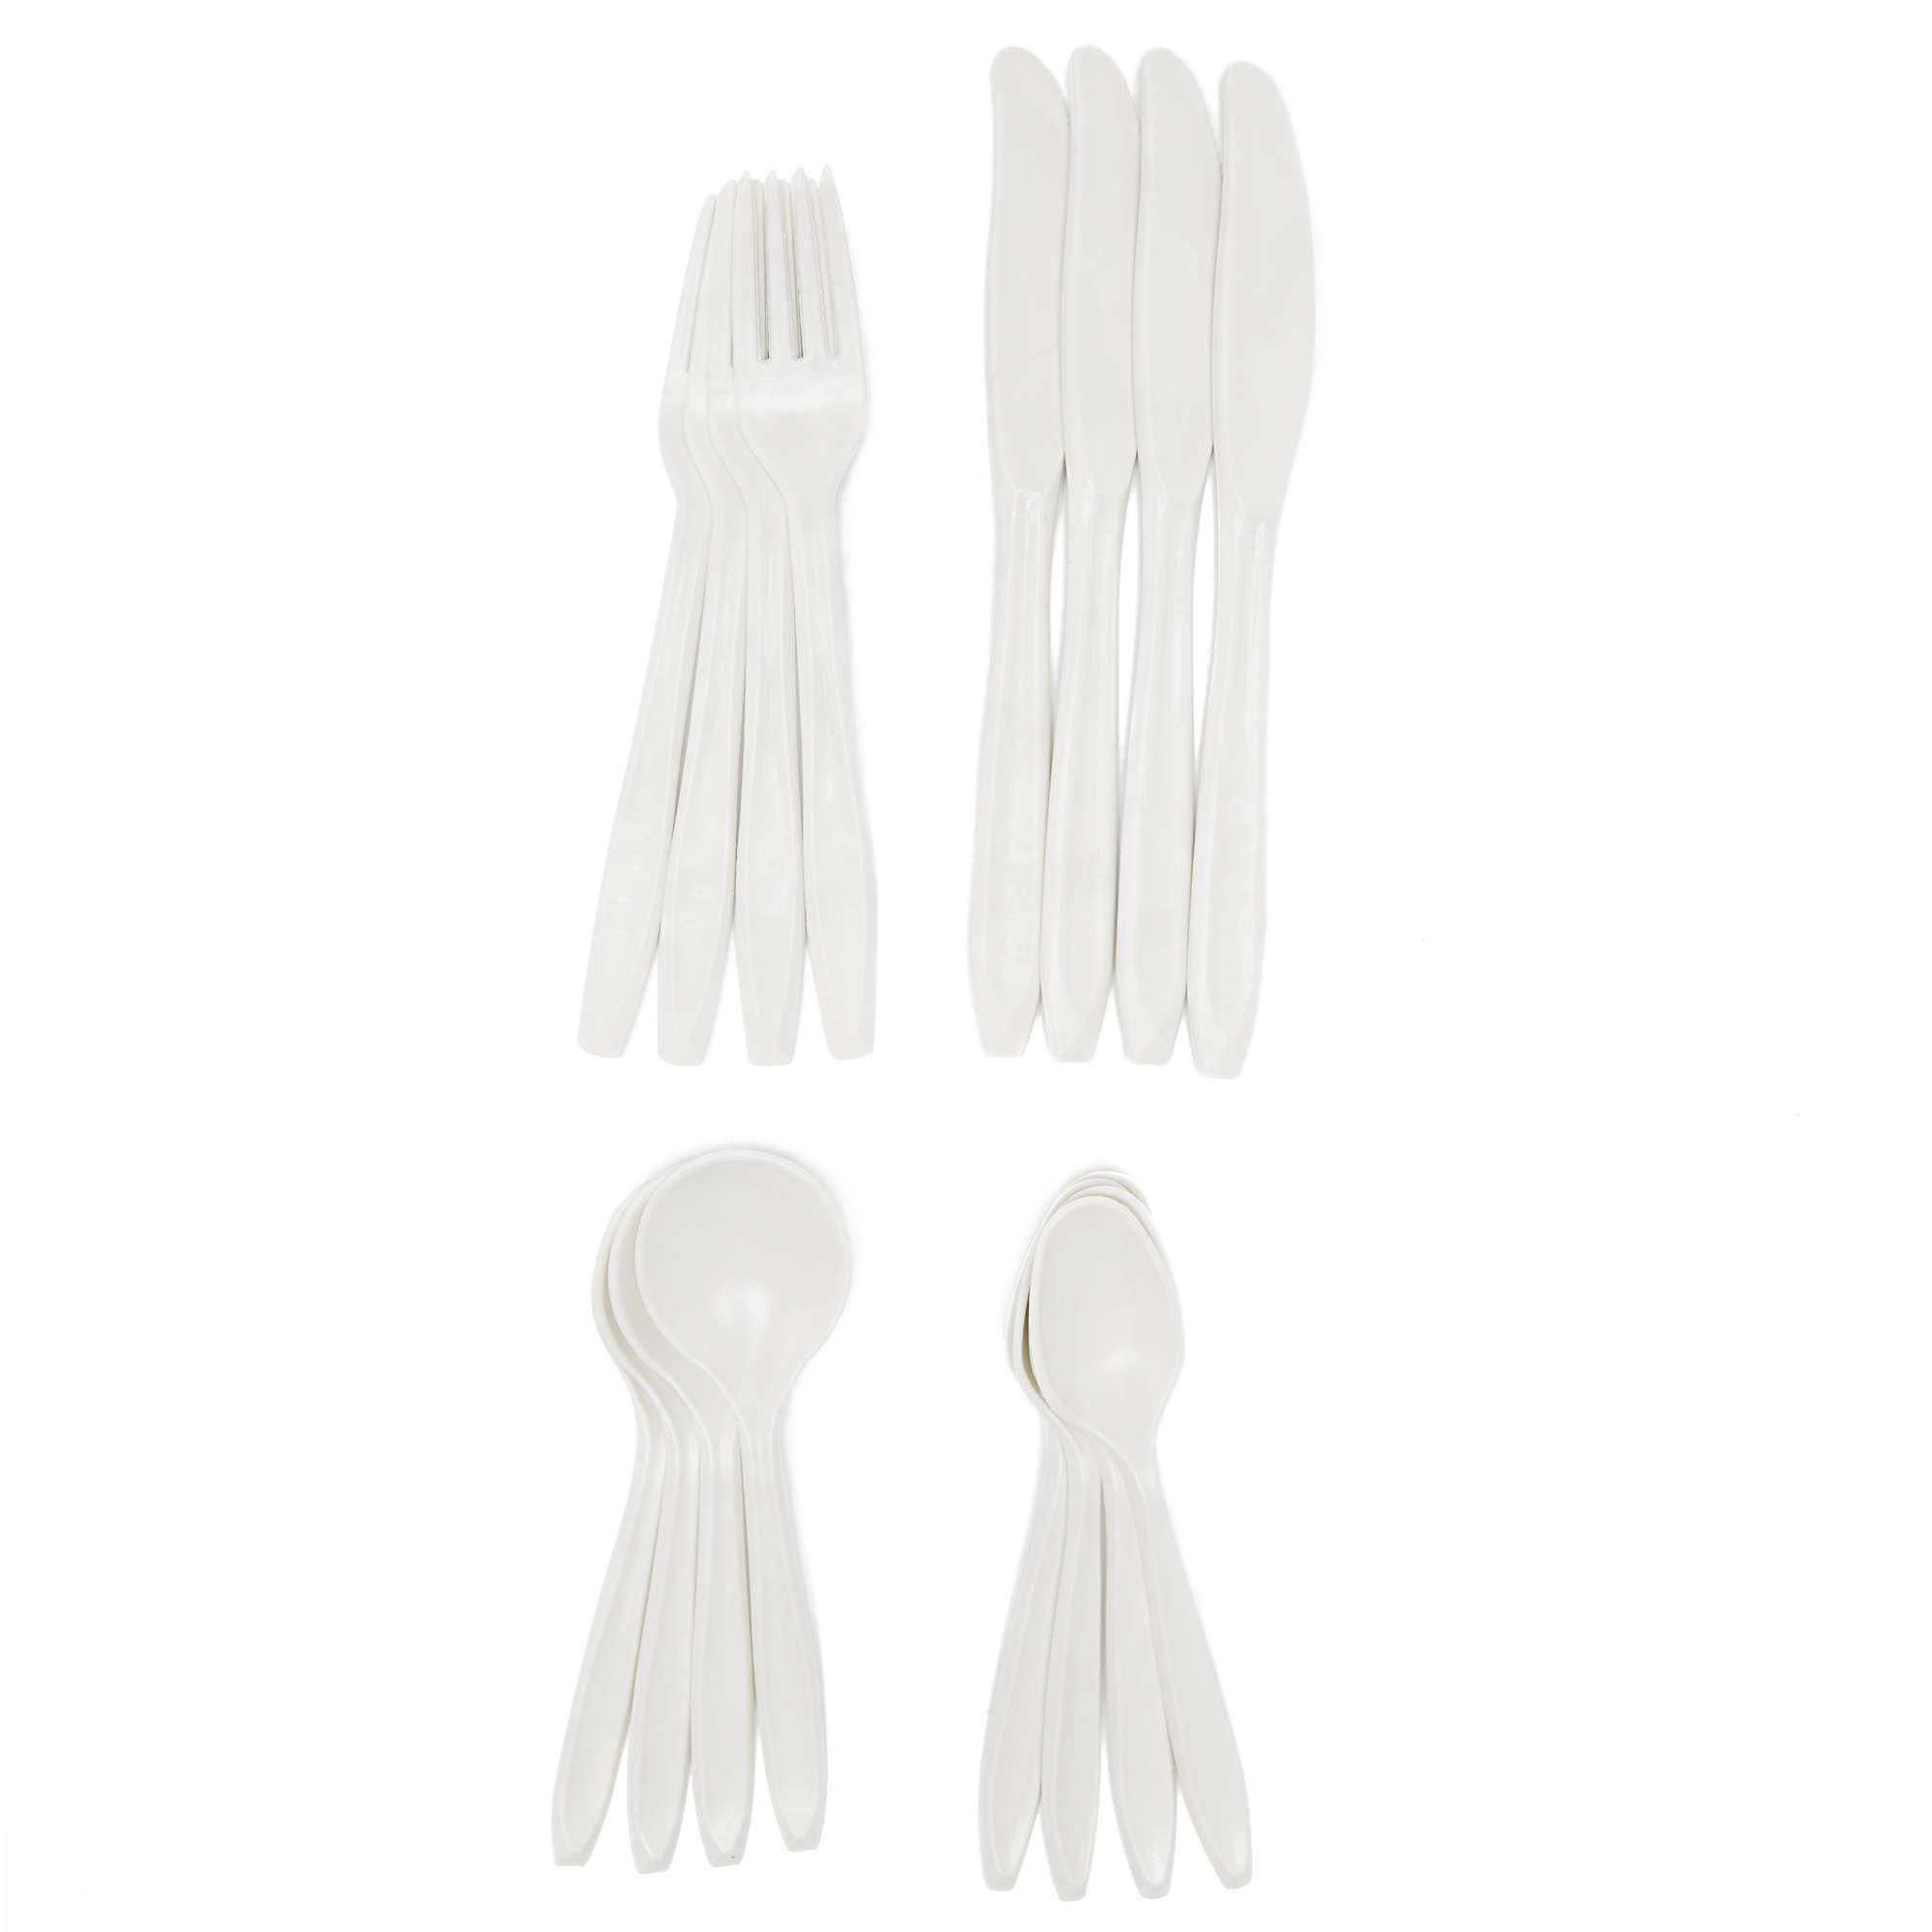 COLEMAN 16 Piece Cutlery Set